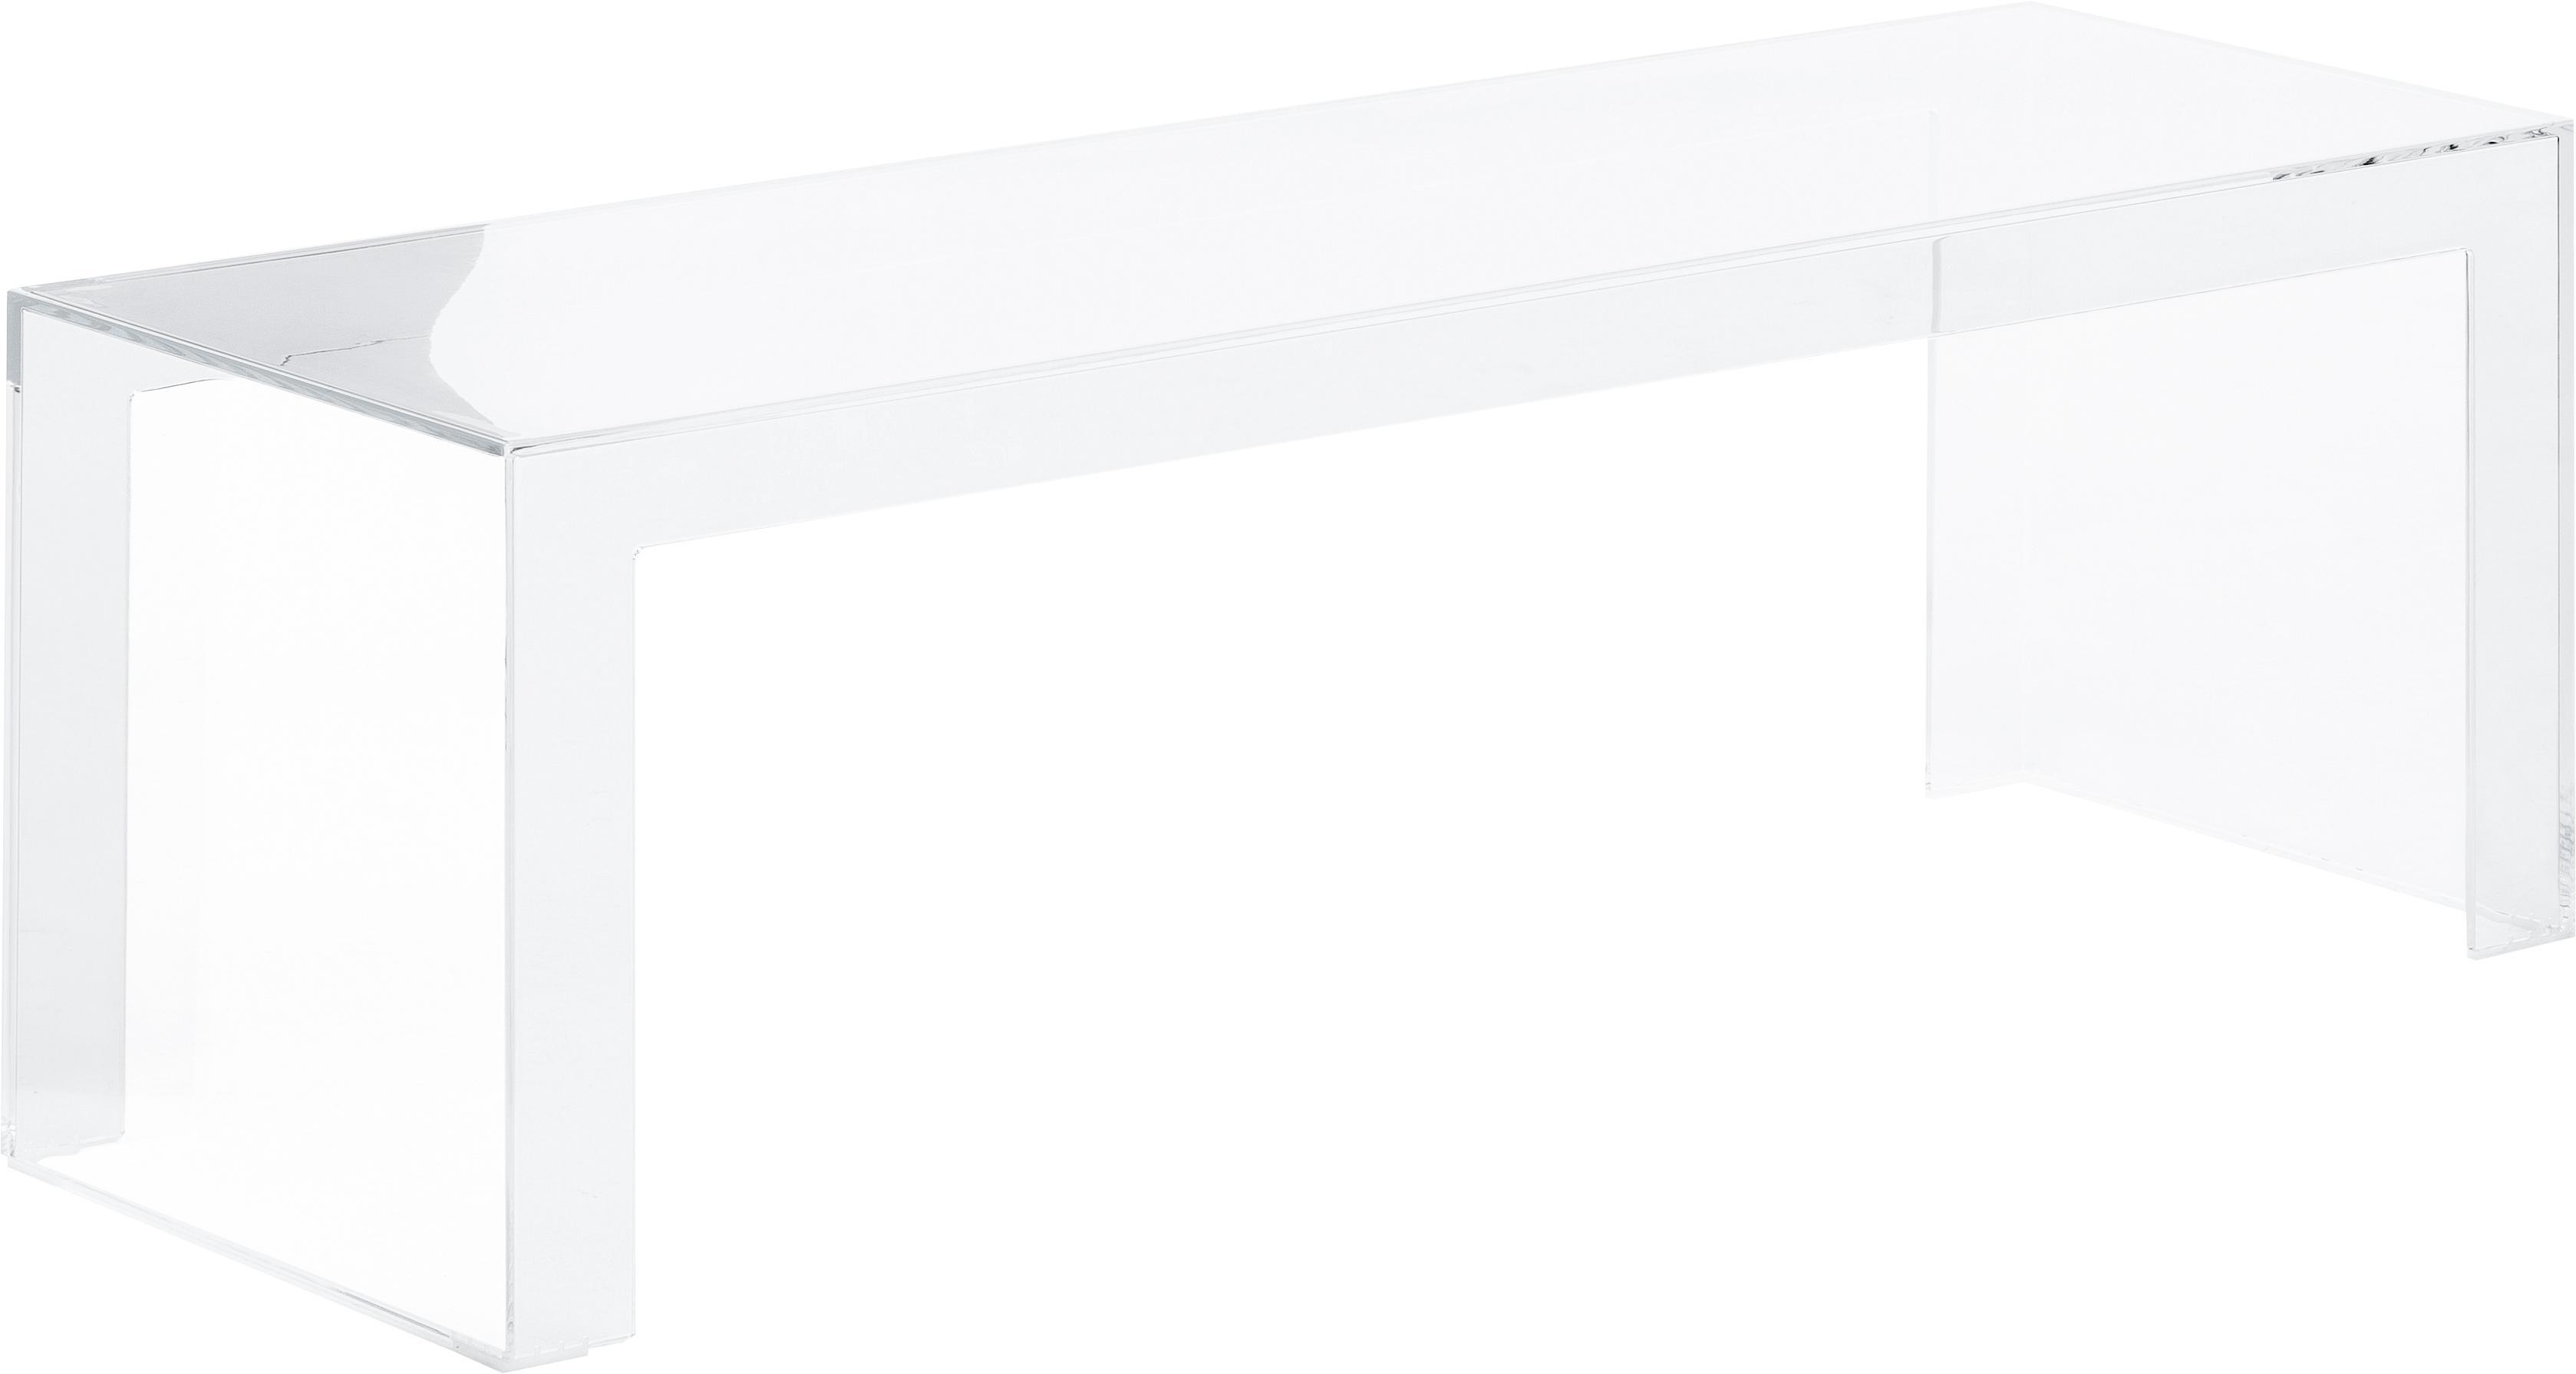 Transparante salontafel Invisible, Kunststof, Transparant, 120 x 40 cm